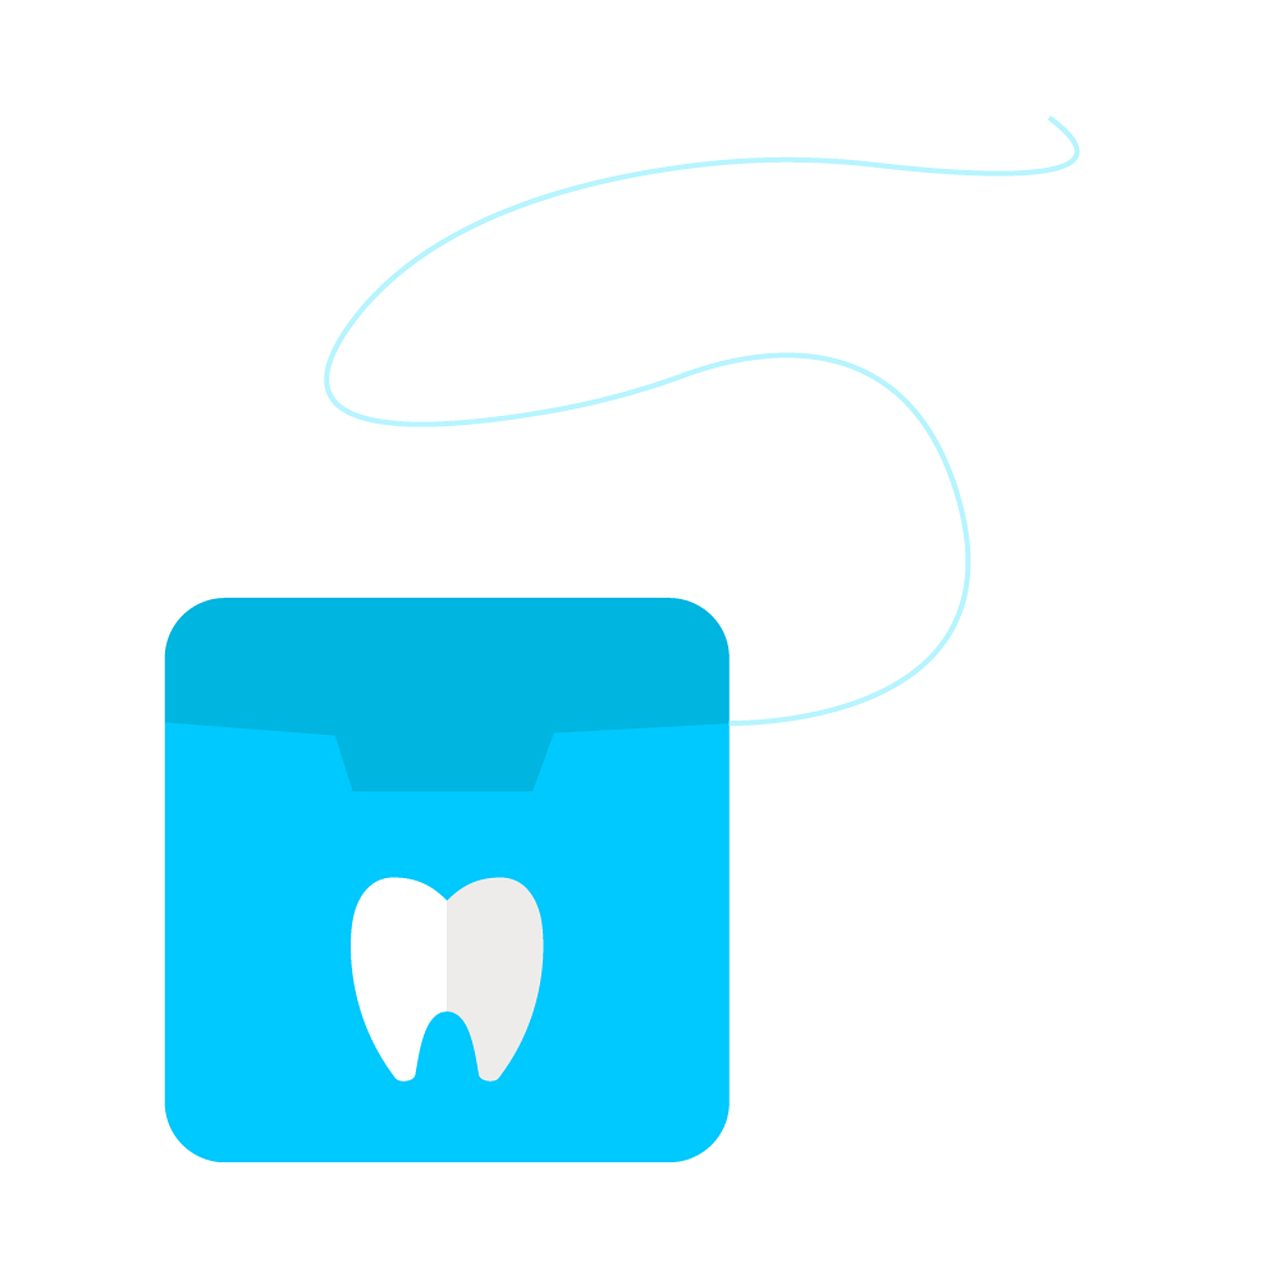 Klein Onstenk Tandarts E J spoedhulp tandarts